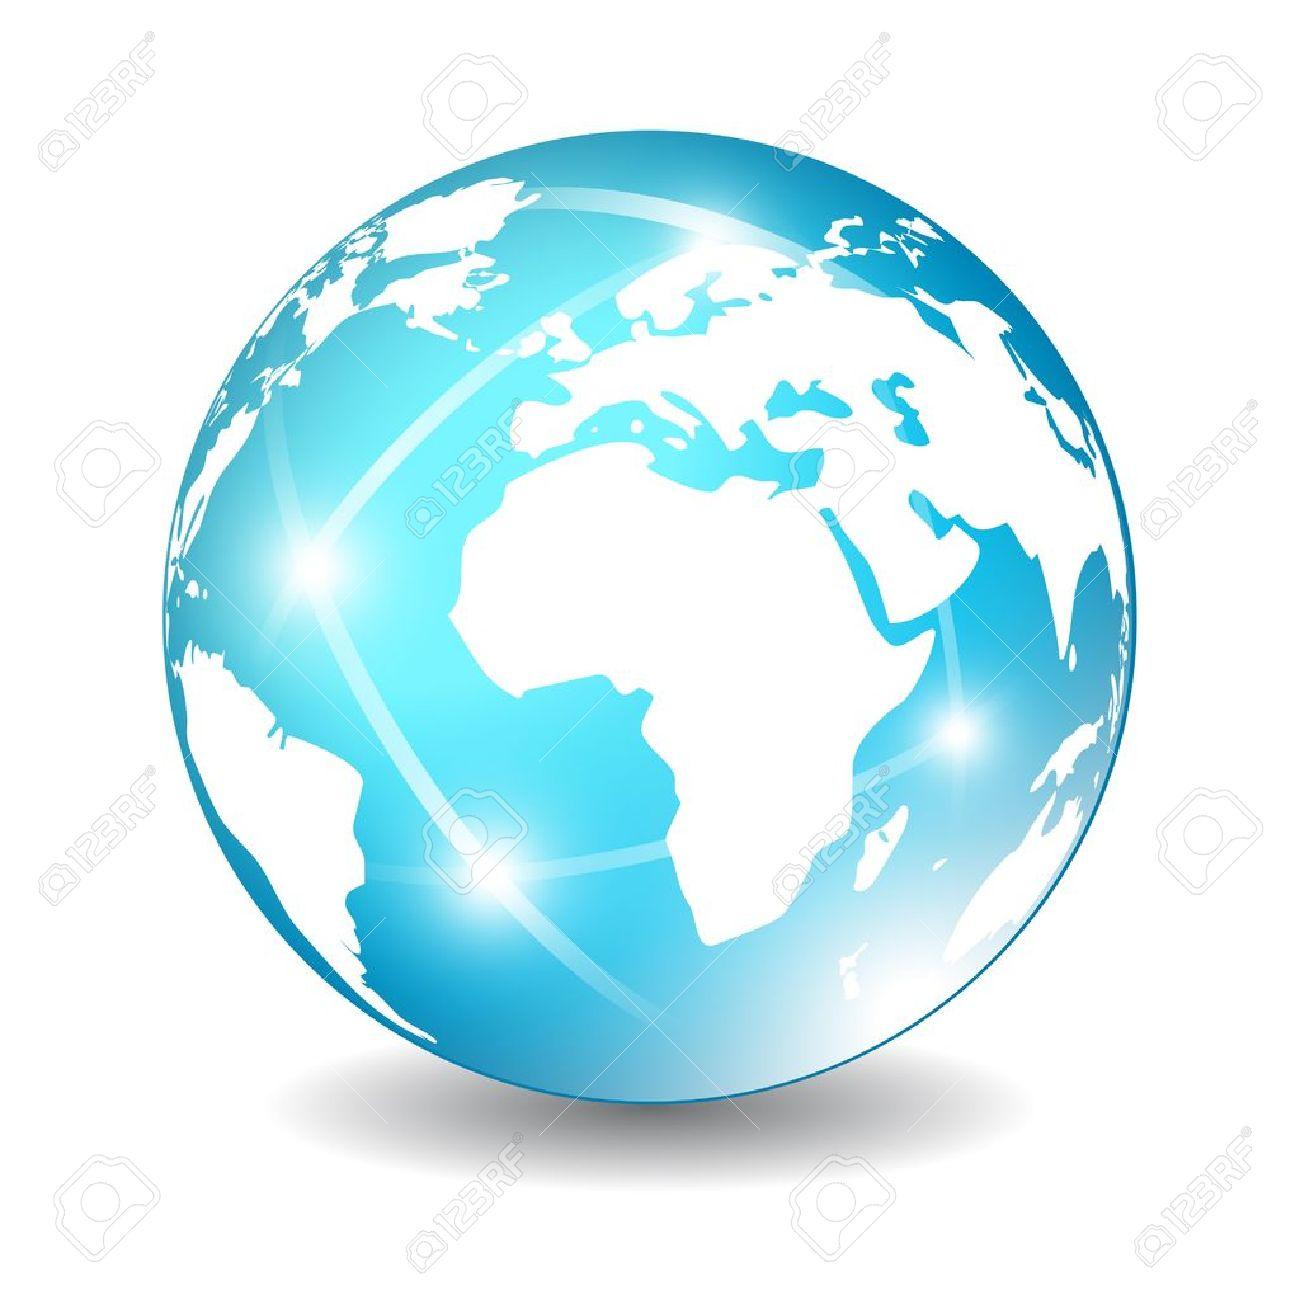 Earth globe icon, vector illustration Stock Vector - 19375856